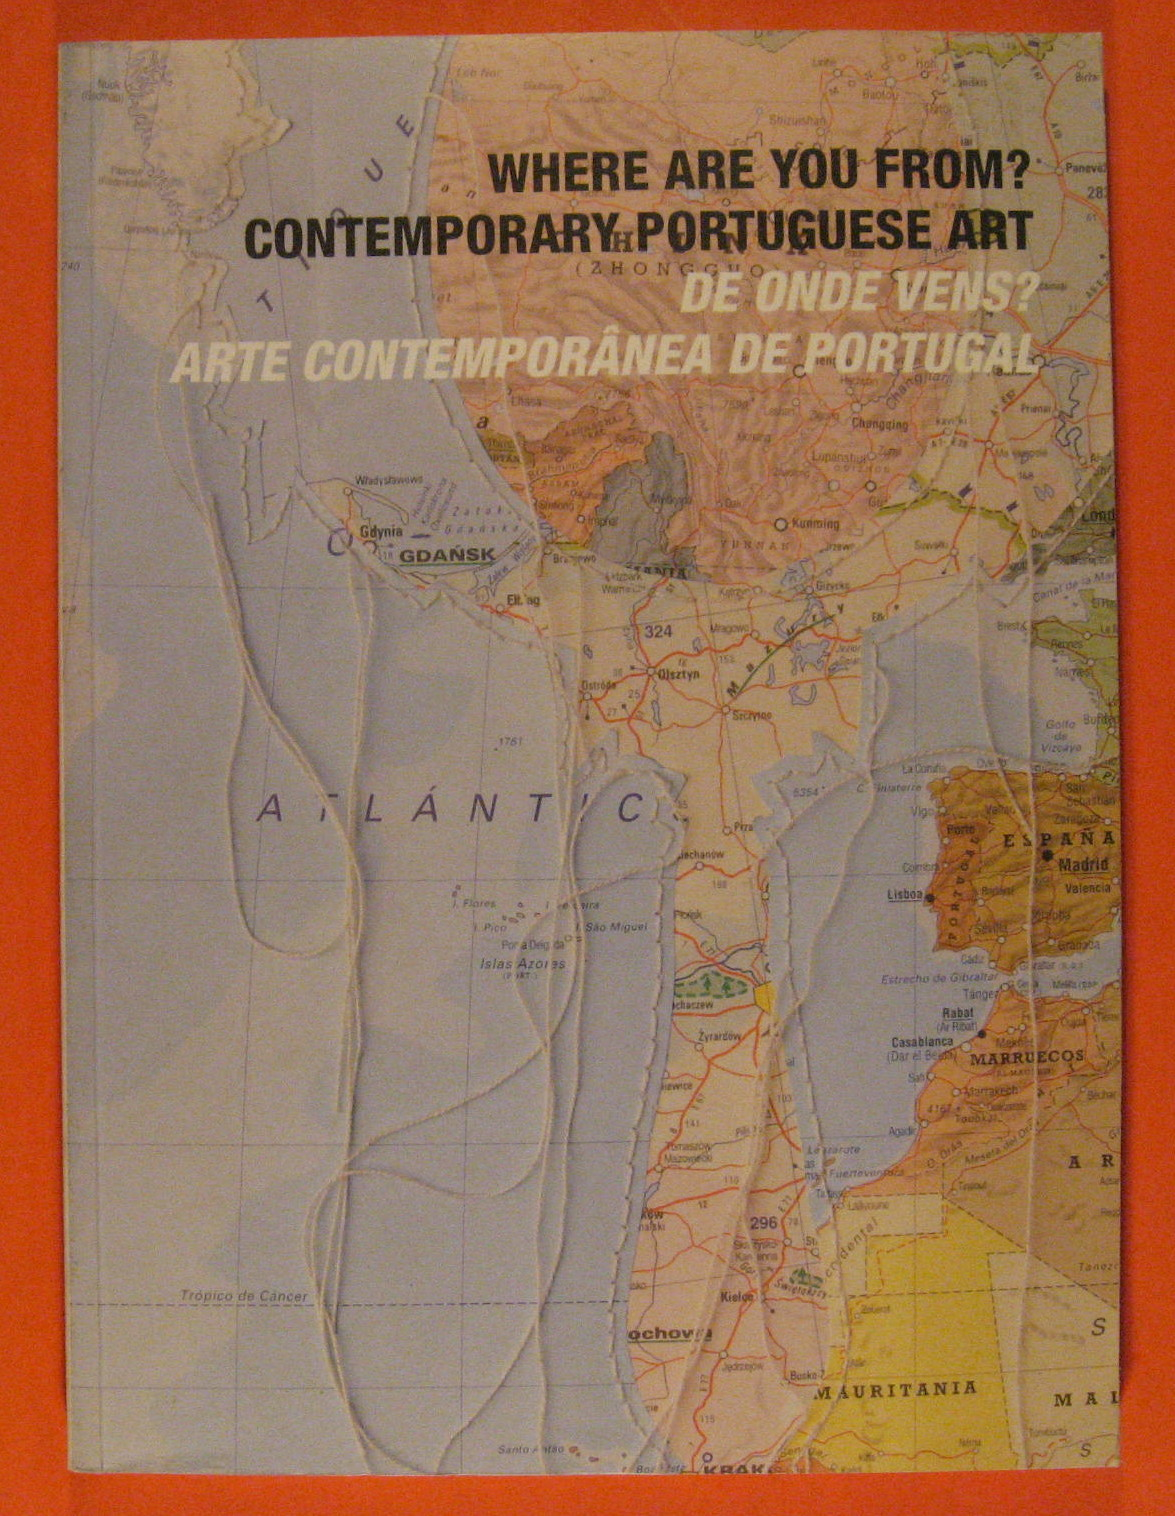 Where Are You From? Contemporary Portuguese Art. De Onde Vens? Arte Contemporanea de Portugal, Wright, Lesley (curator). Jane Gilmor and Miguel von Hafe Perez (essays)